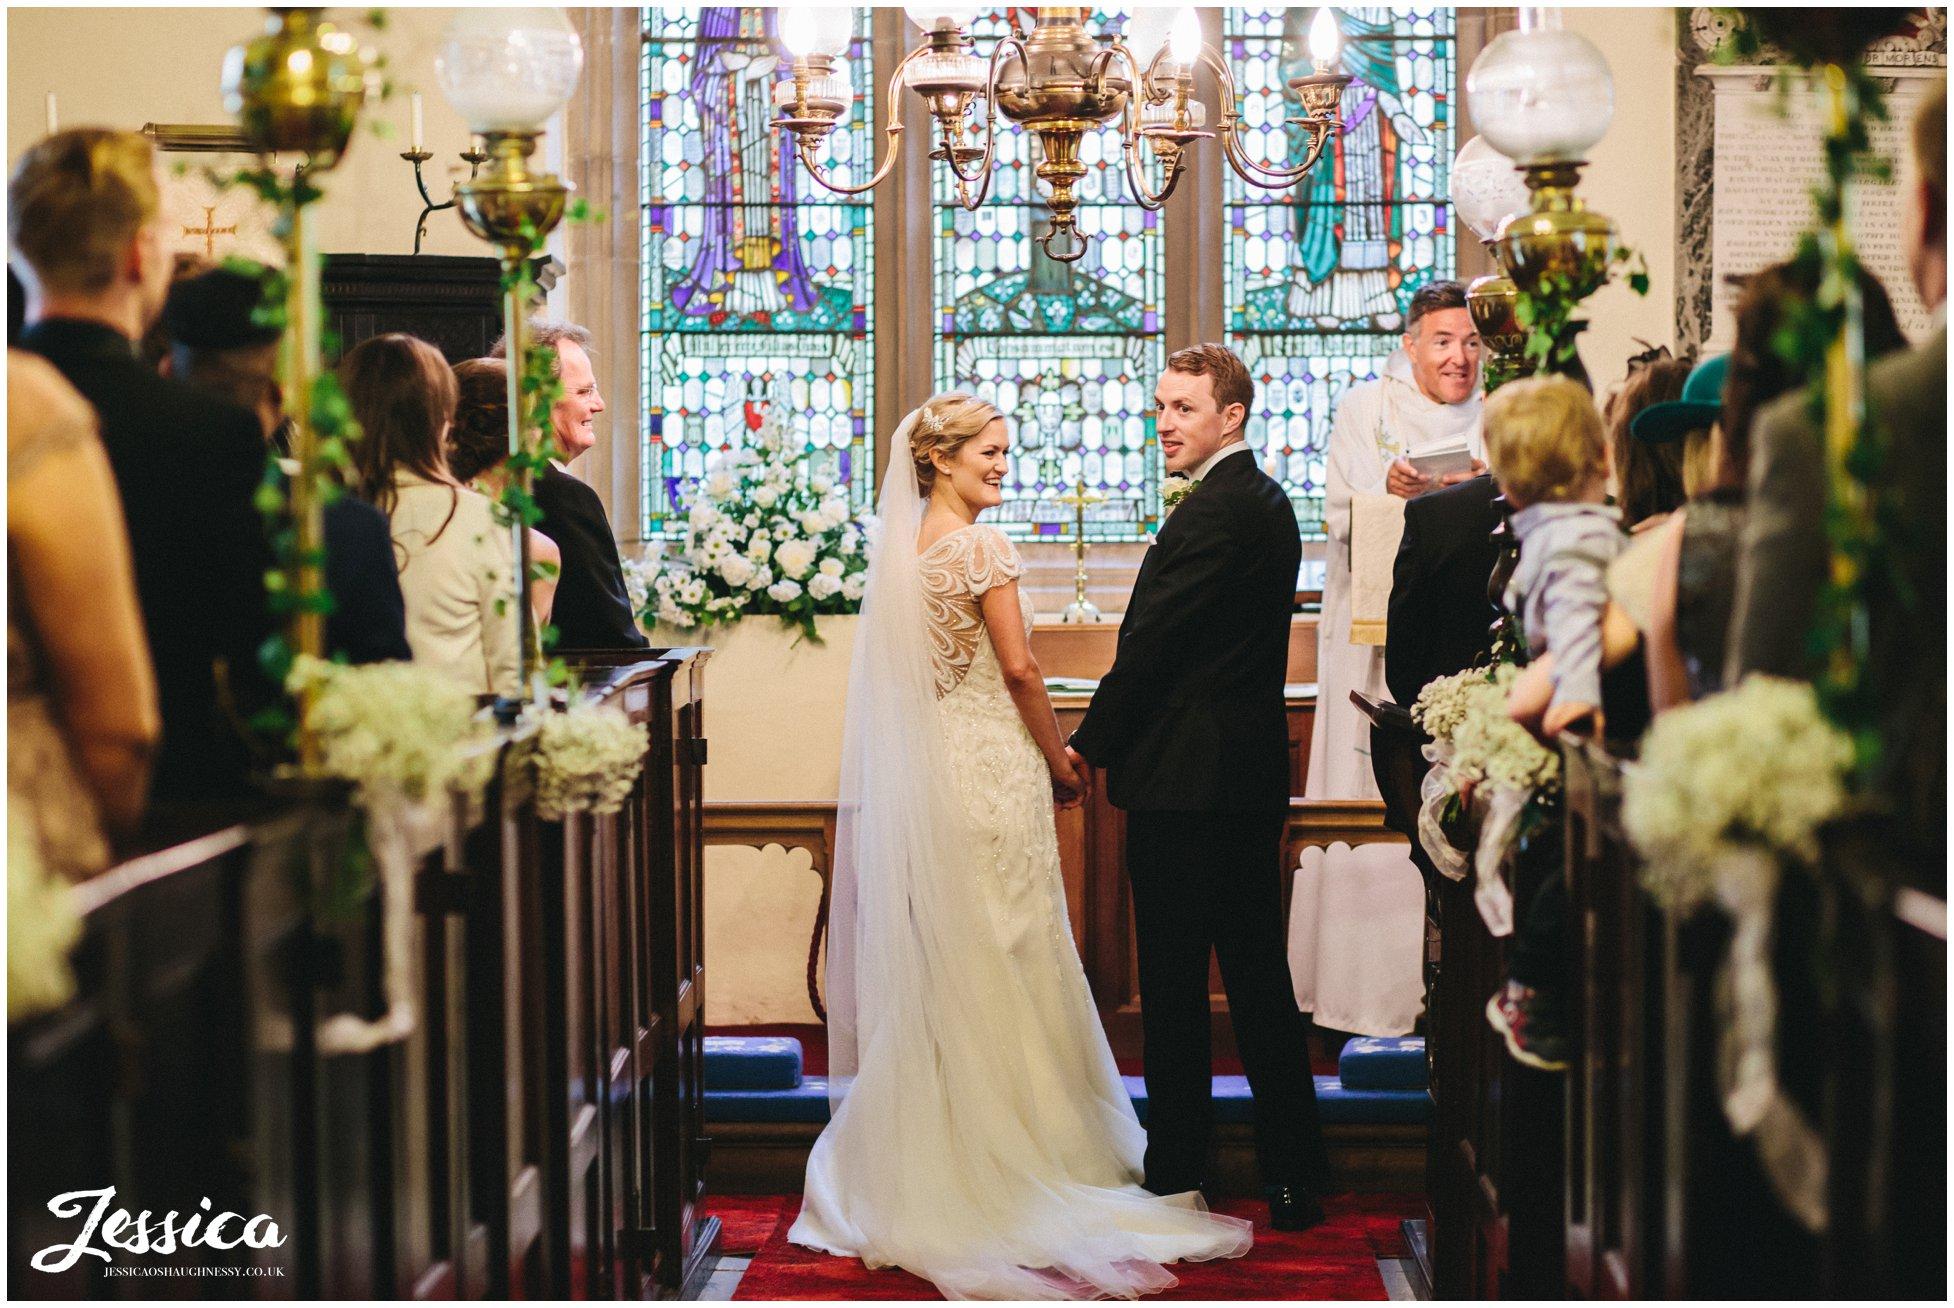 Bride & Groom during their wedding ceremony at Trevor Church